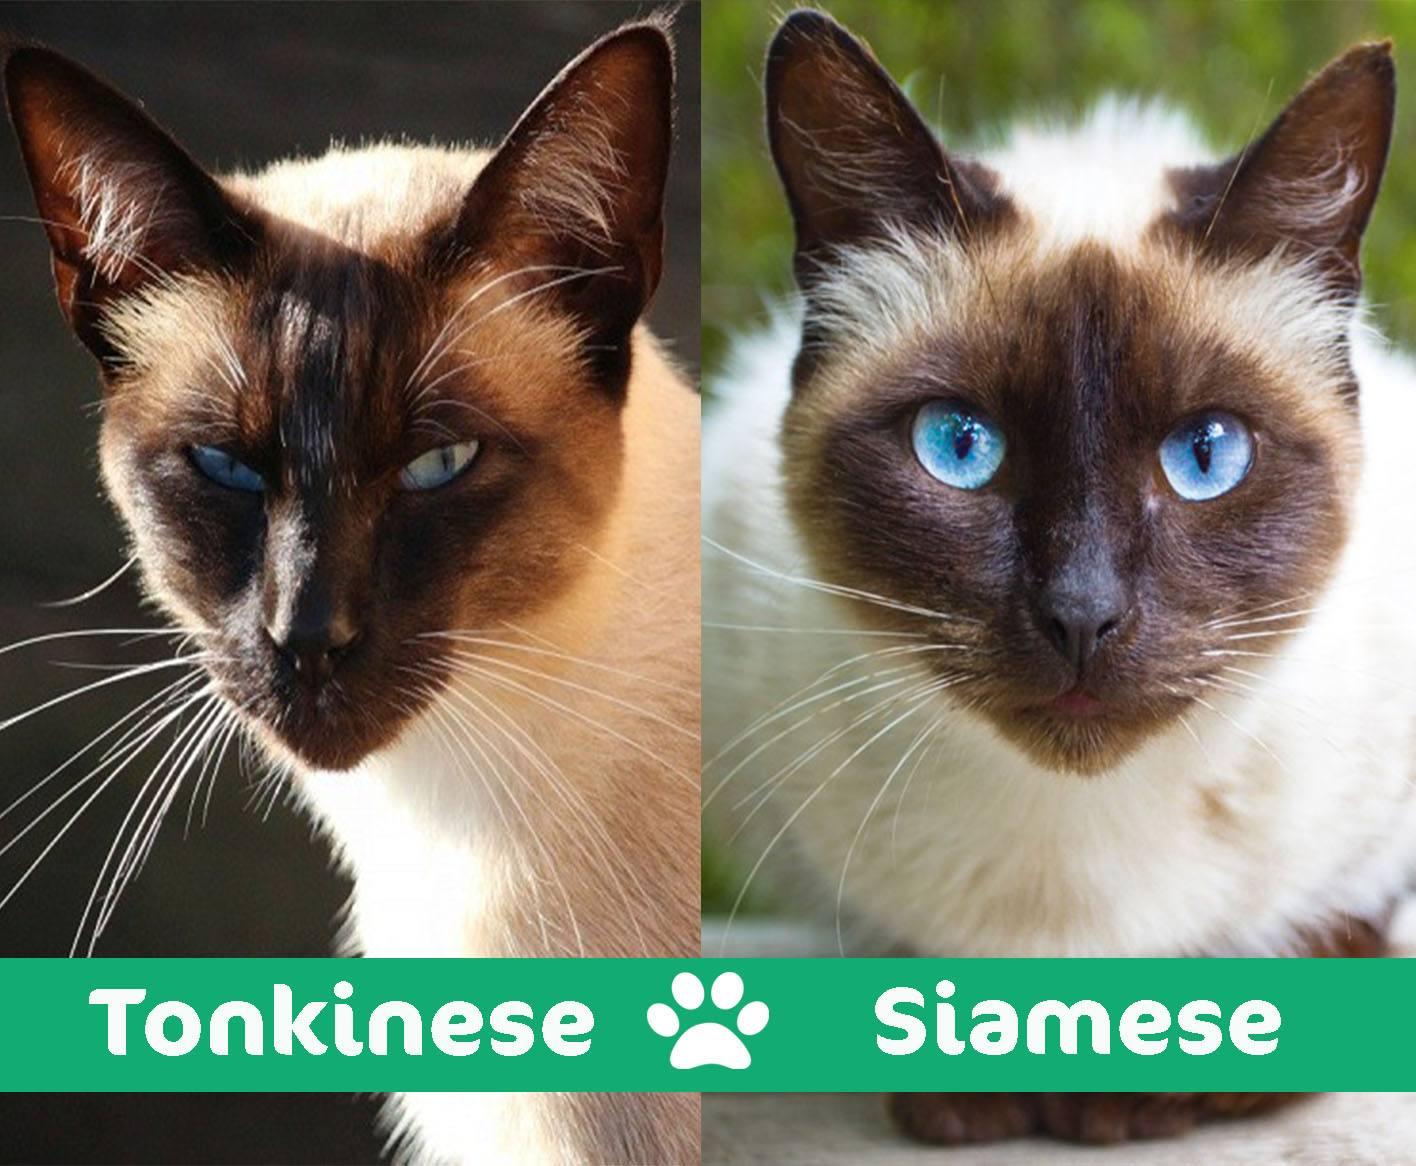 tonkinese vs siamese